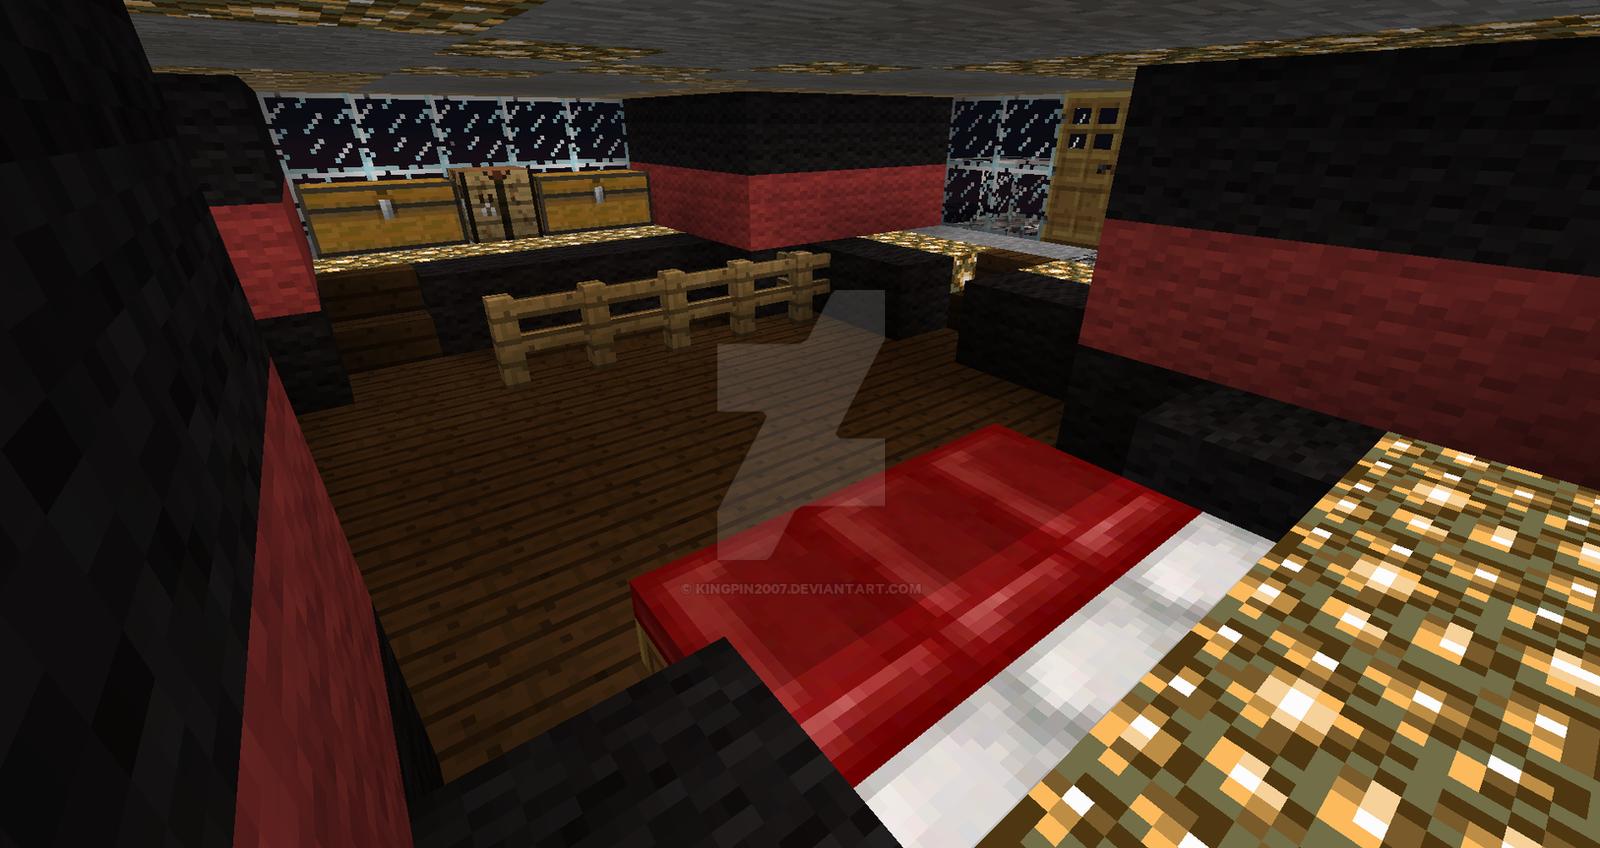 Castle master bedroom -  Castle Kp Master Bedroom Minecraft Fortress By Kingpin2007